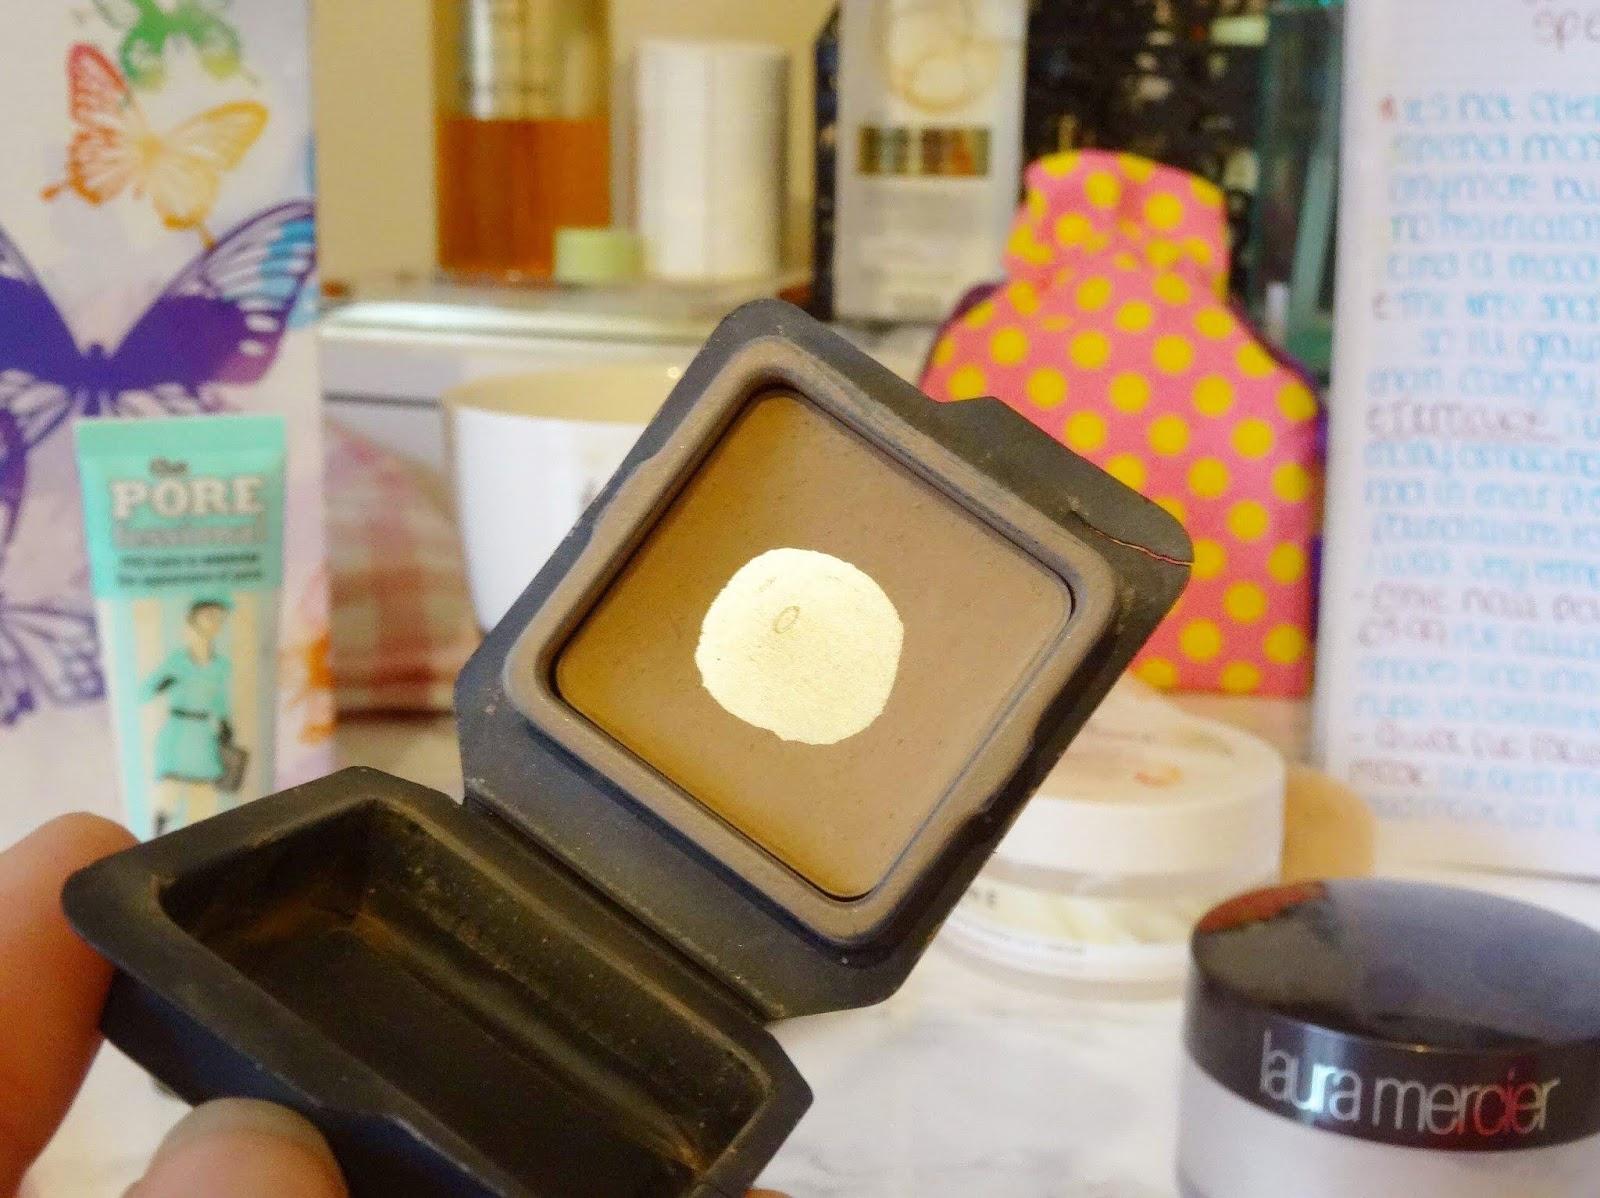 Benefit Hoola Bronzer Pan